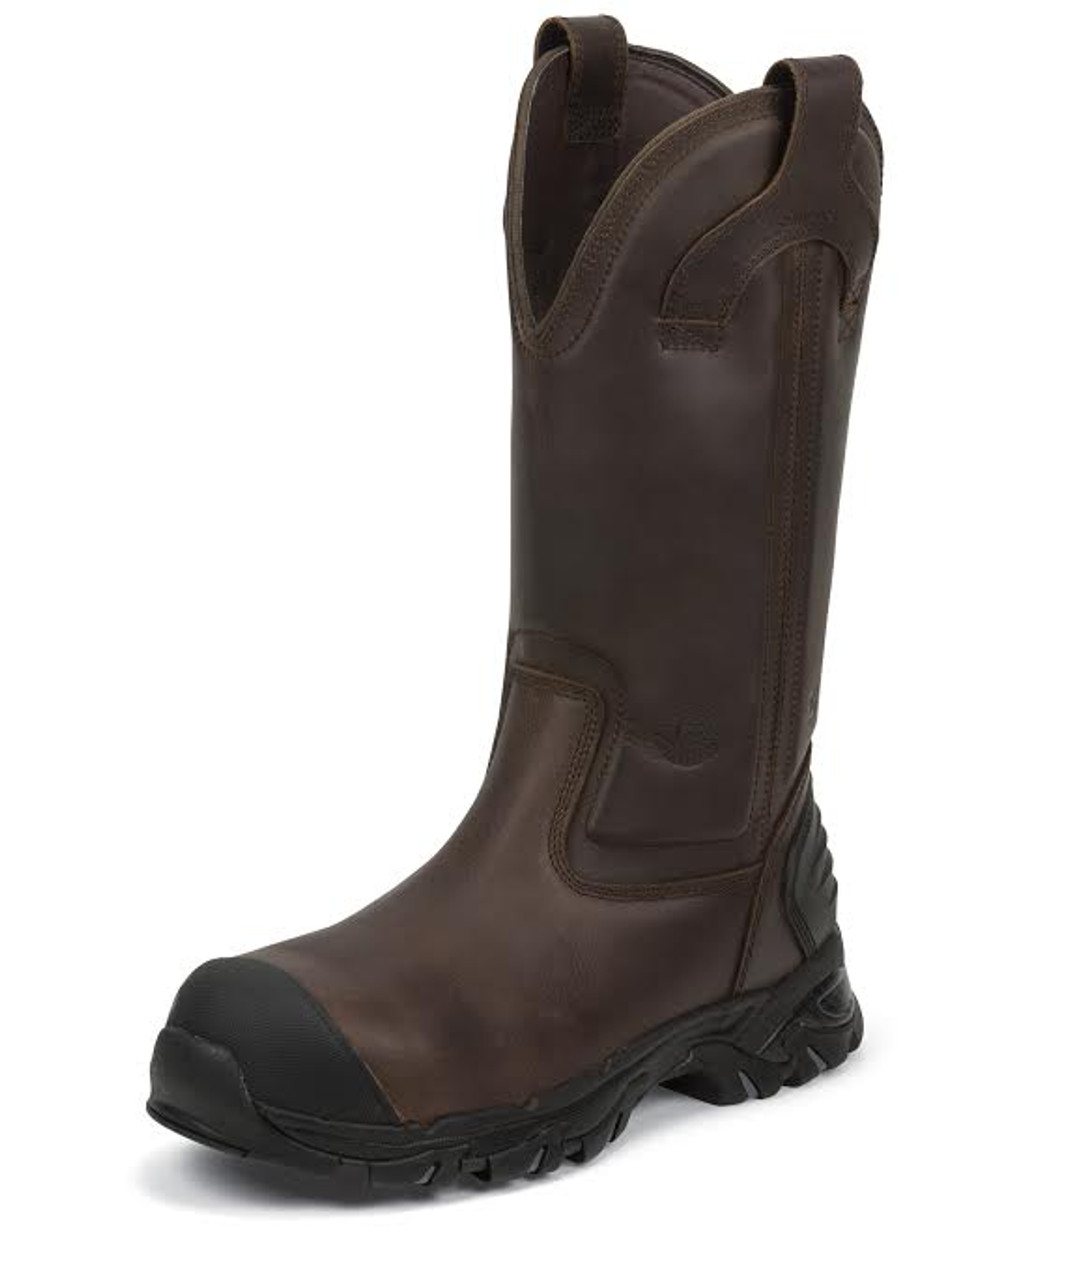 Waterproof CSA Safety Boot